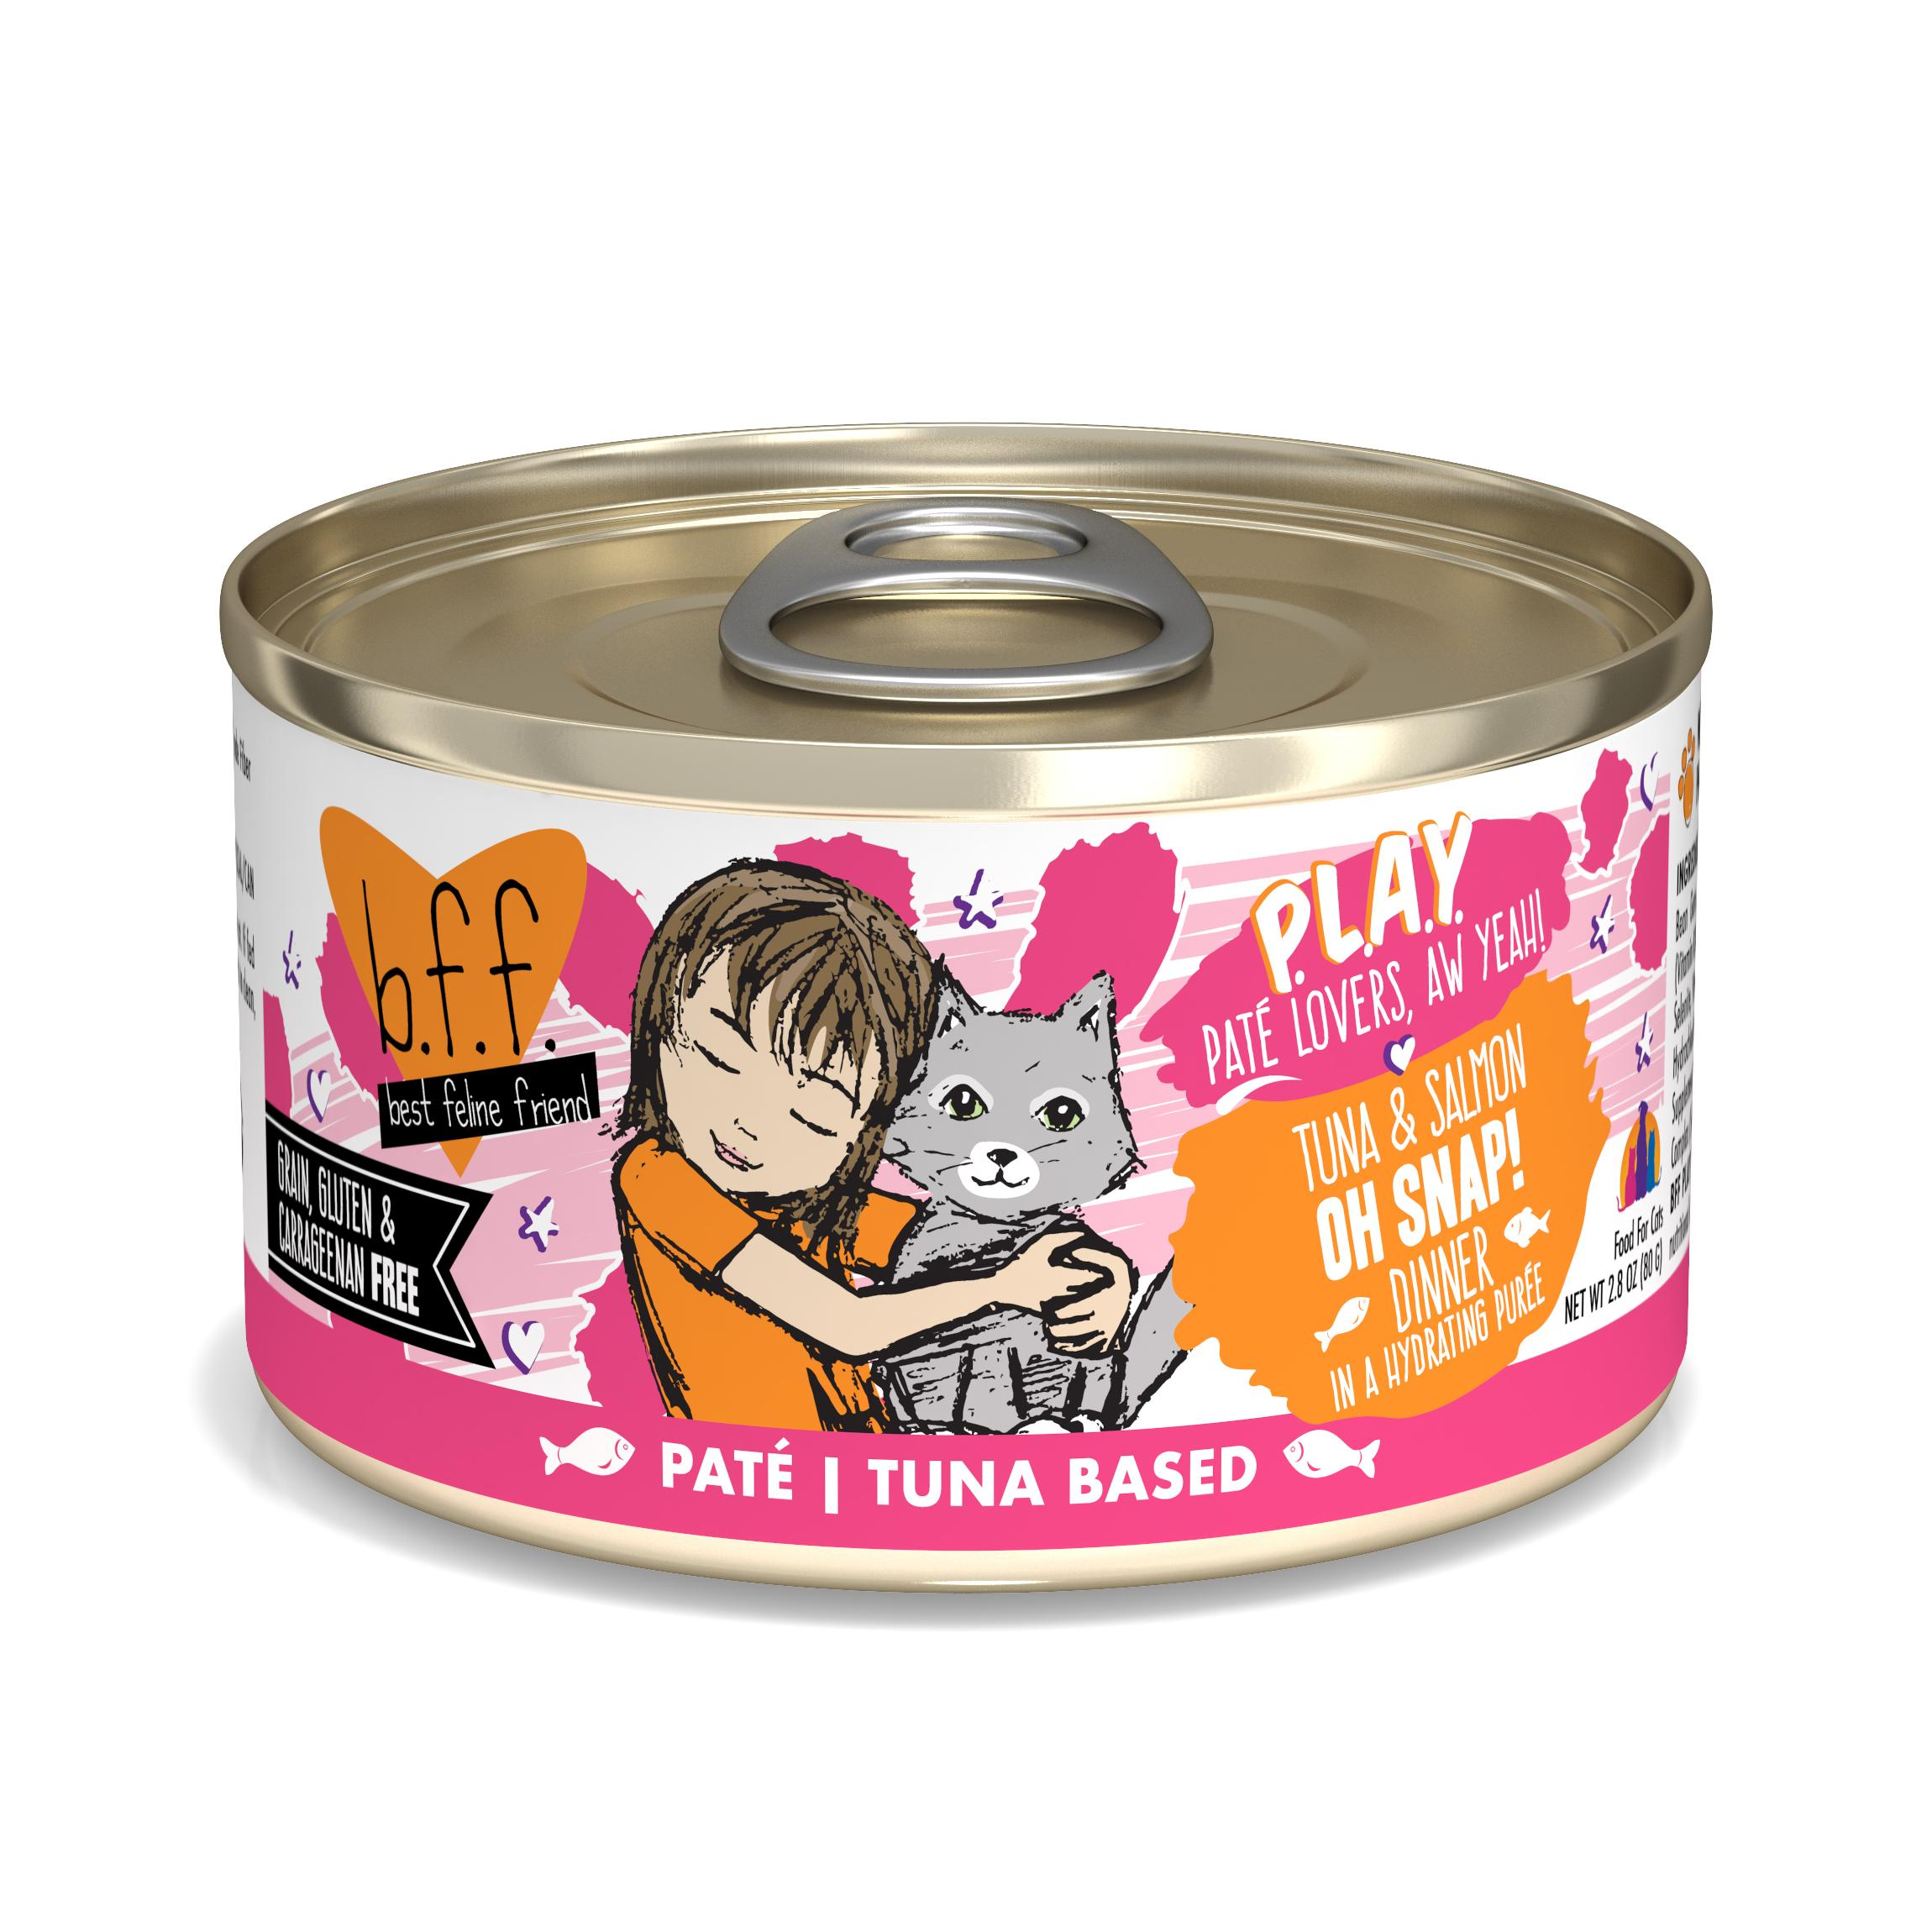 BFF PLAY Pate Oh Snap! Tuna & Salmon Dinner in Puree Grain-Free Wet Cat Food, 2.8-oz